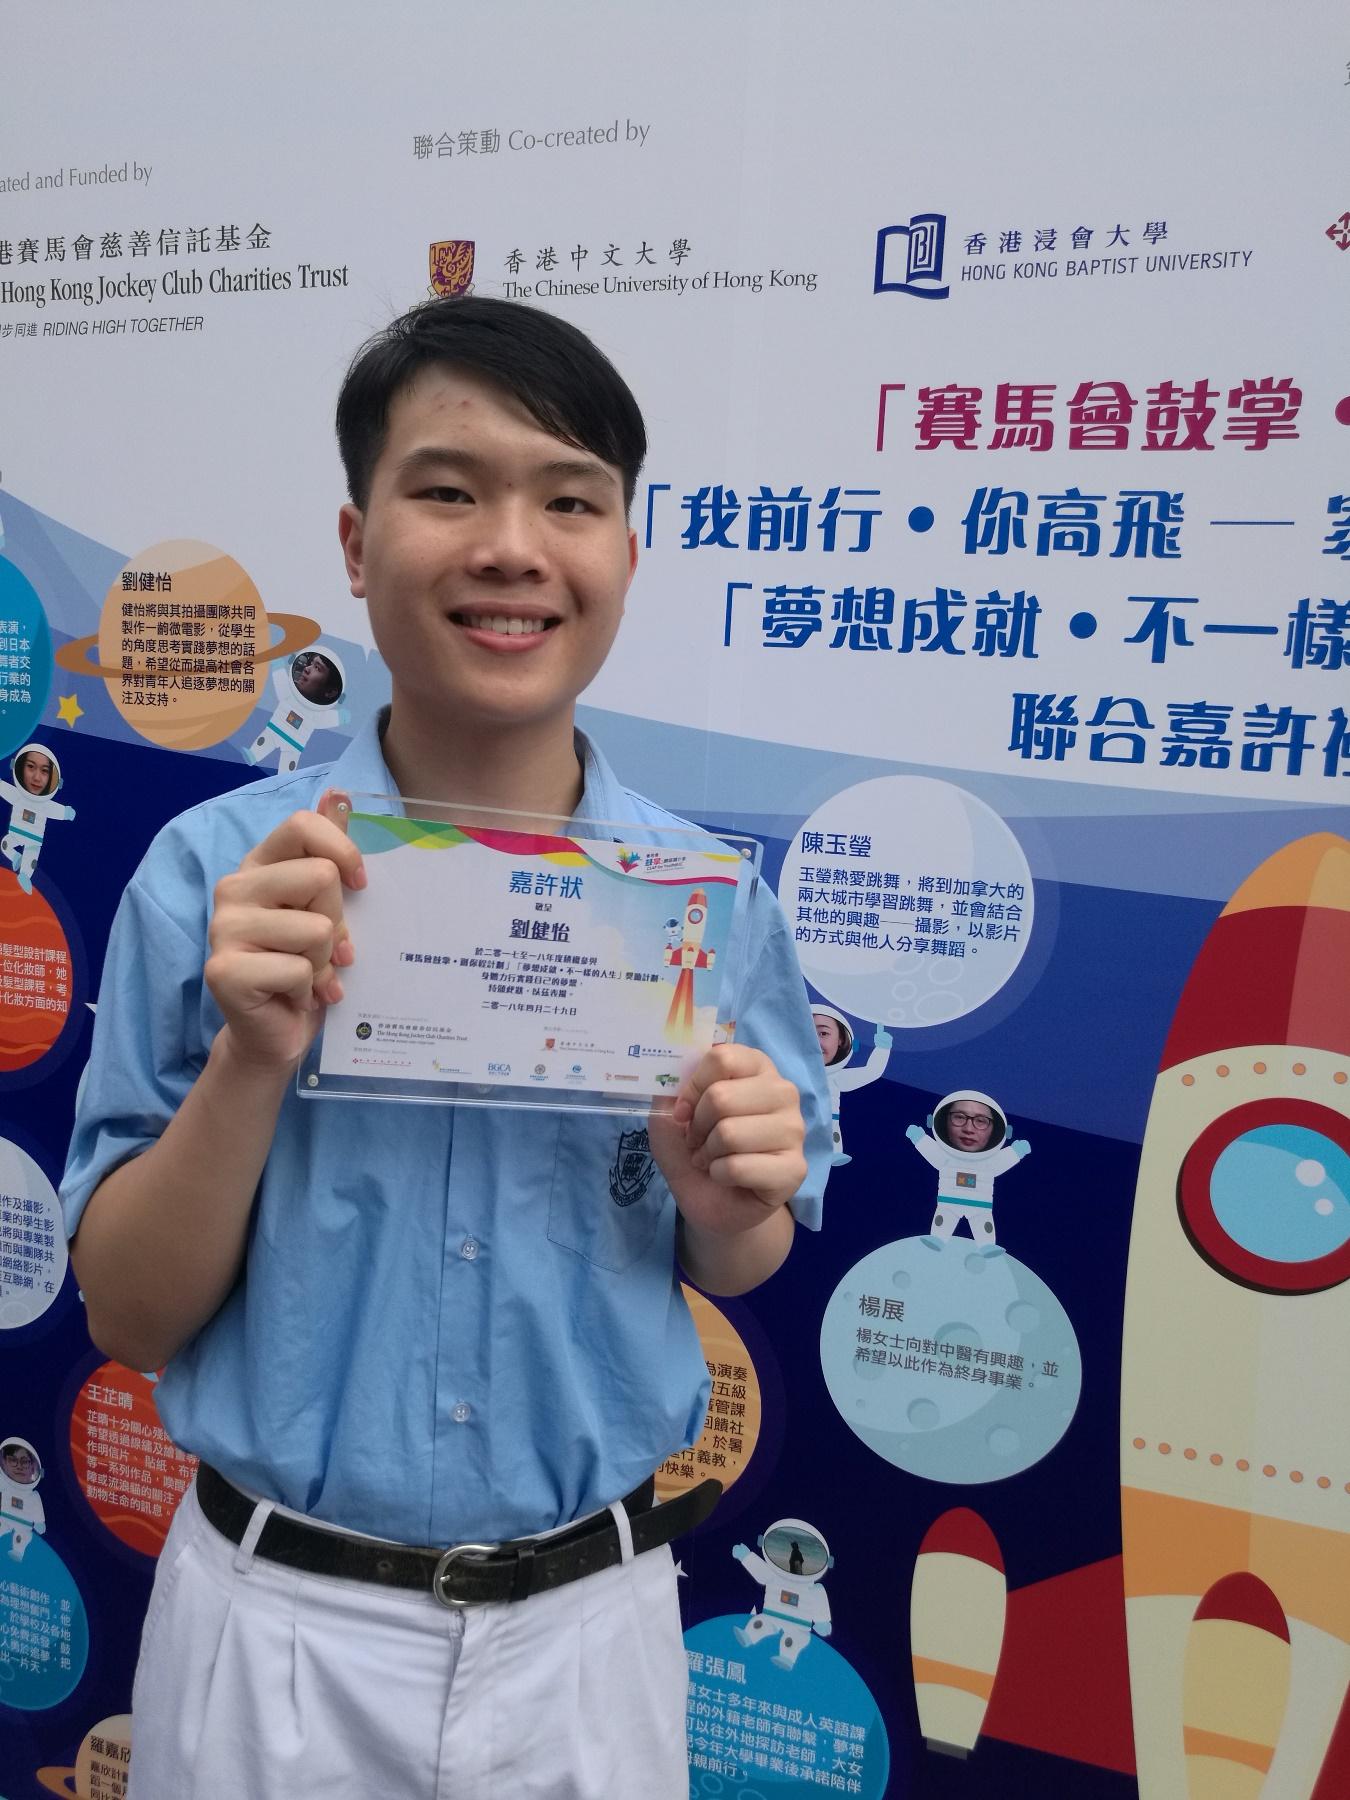 http://npc.edu.hk/sites/default/files/img_20180429_165917.jpg